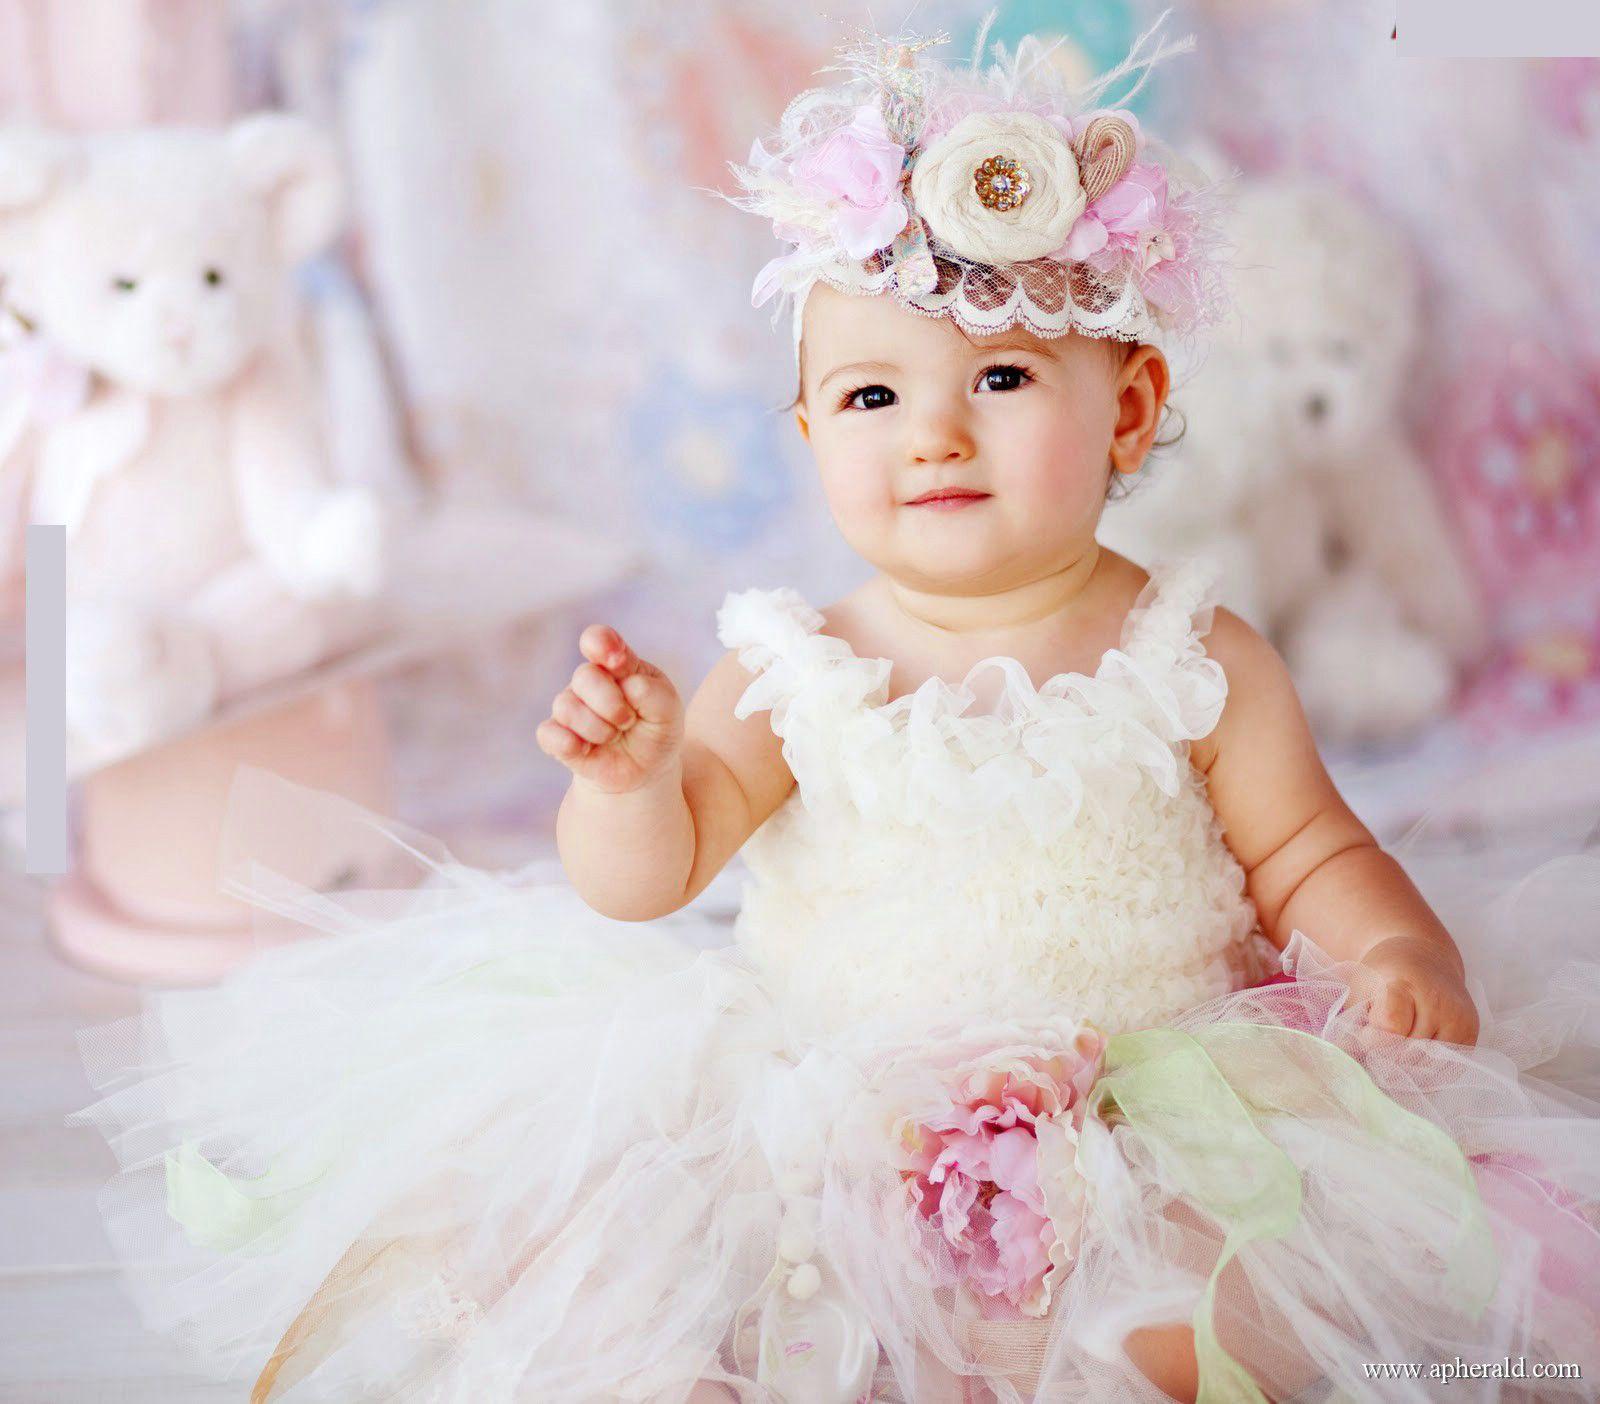 Cute Sad Baby Girl Images Hd - #1 wallpaper